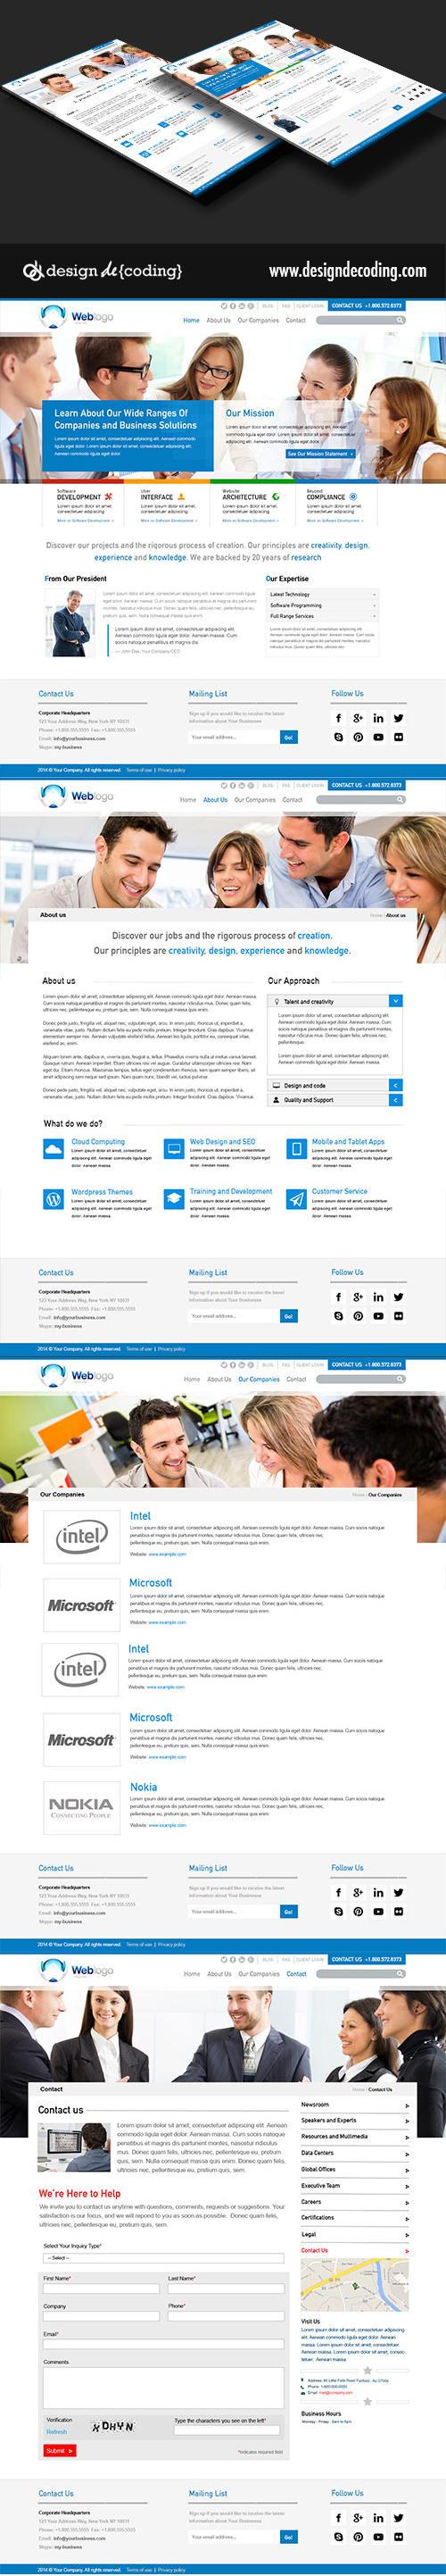 Corporate UI Website Design Layout PSD by designdecoding